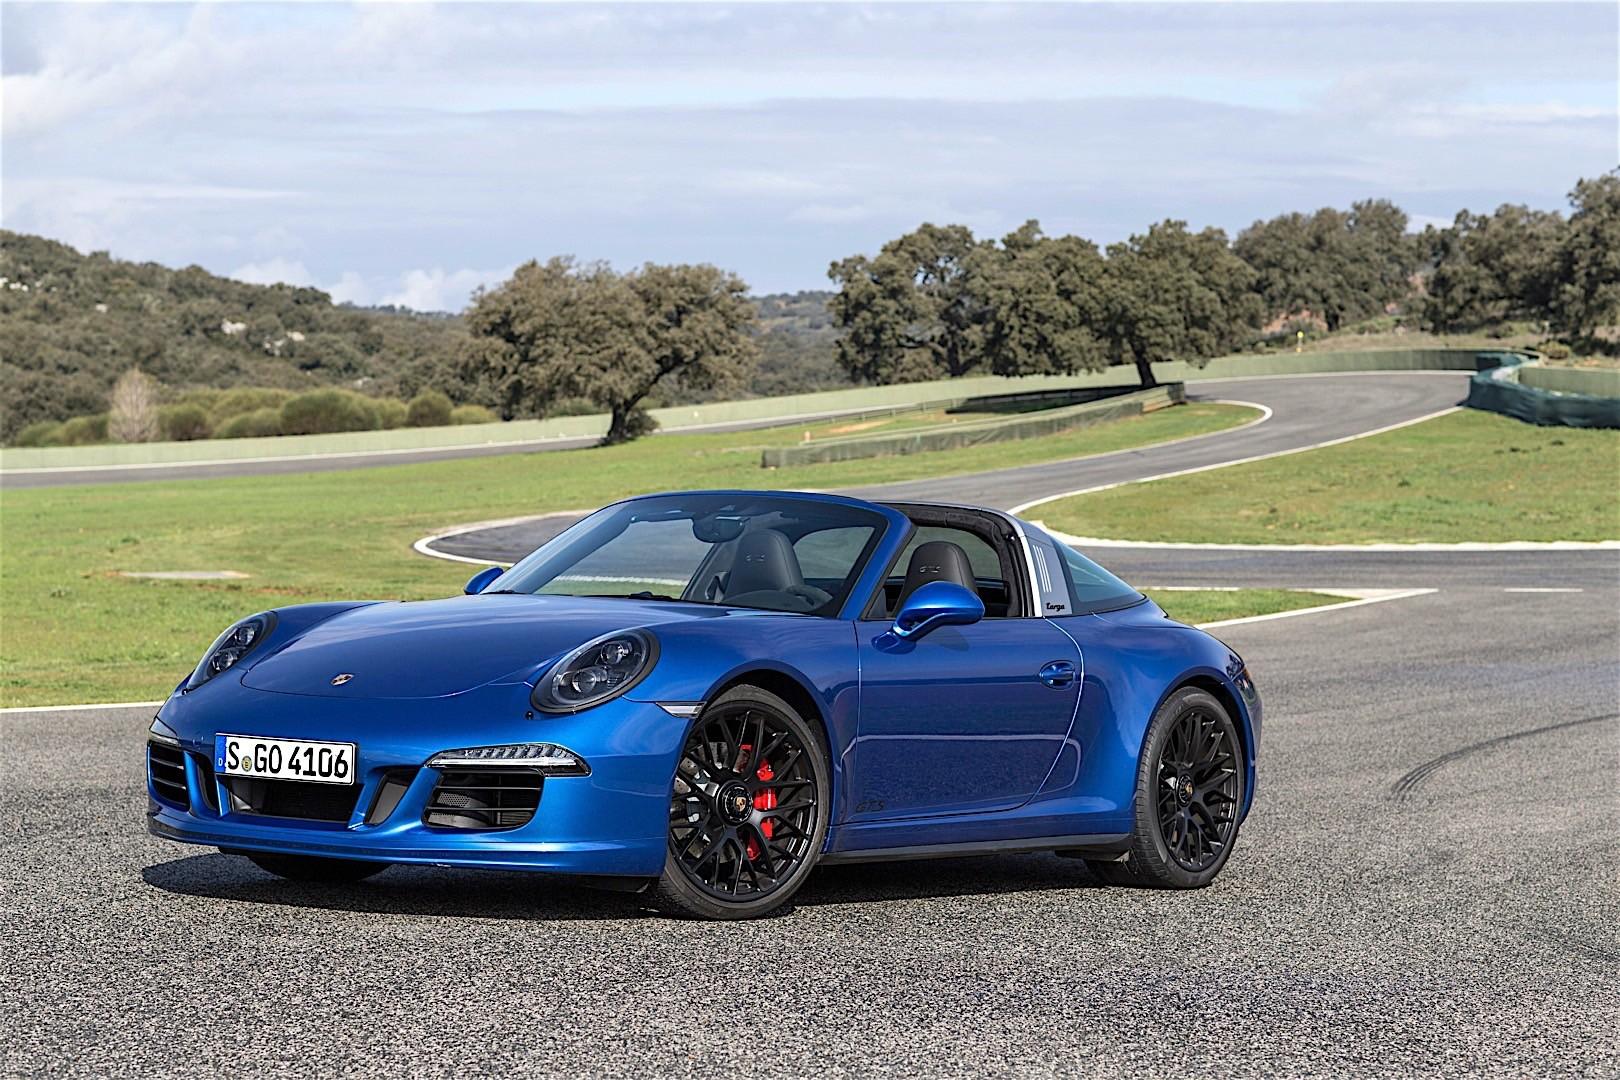 Porsche Targa 4 Gts 991 Specs 2015 2016 2017 2018